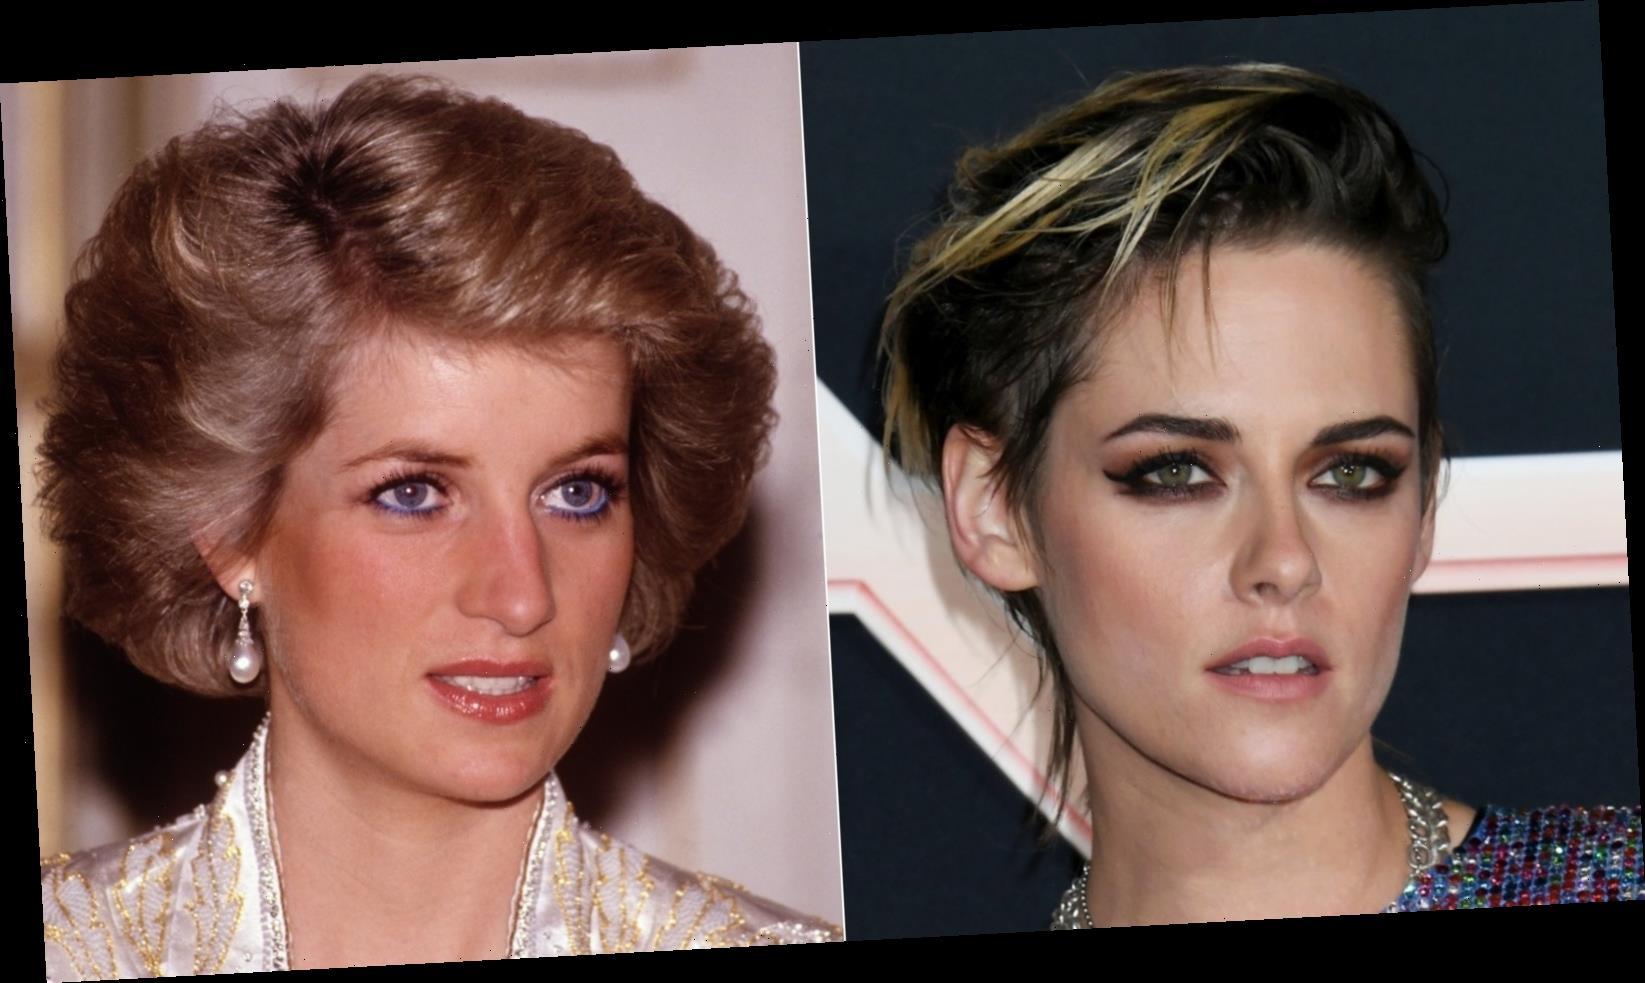 Kristen Stewart Is Unrecognizable As Princess Diana